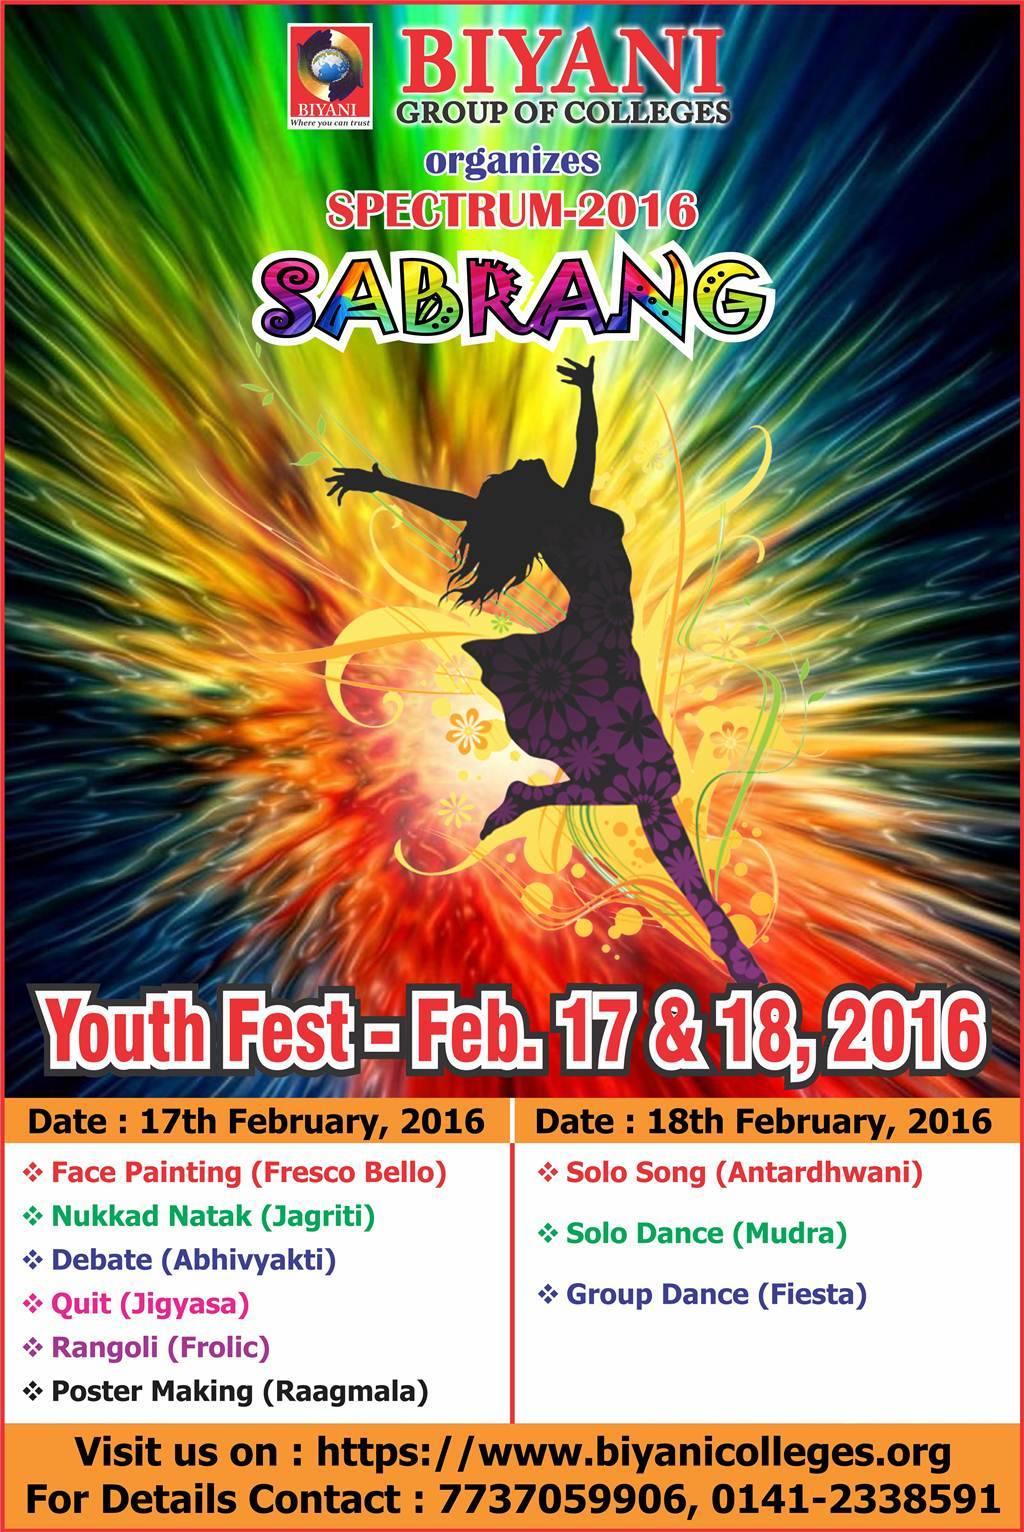 SABRANG Youth Fest Spectrum 2016